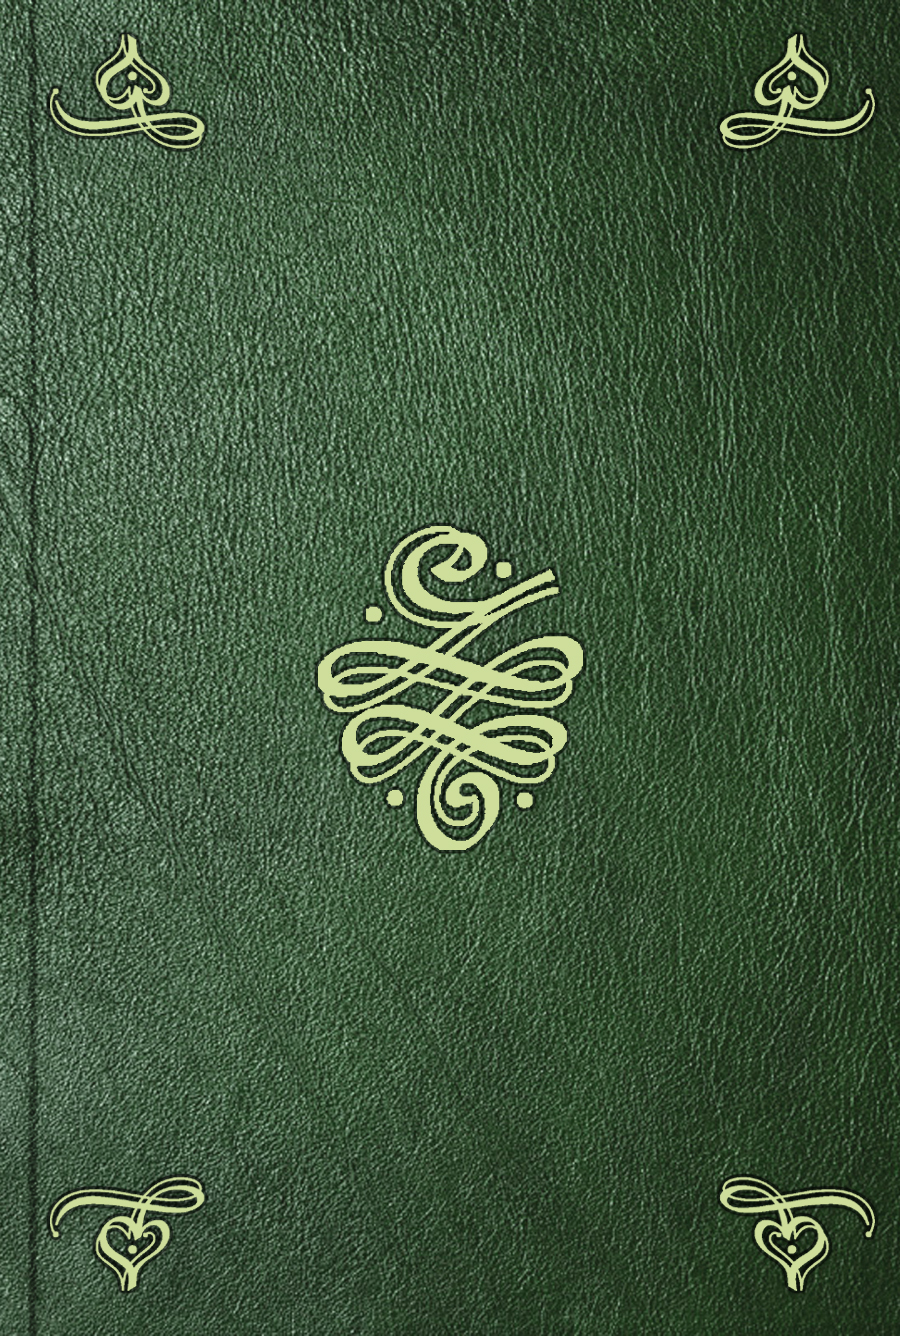 Johann Jakob Engel J. J. Engel's Schriften. Bd. 9. Philosophische Schriften. T. 1 футболка perfect j perfect j pe033ewaowy7 page 9